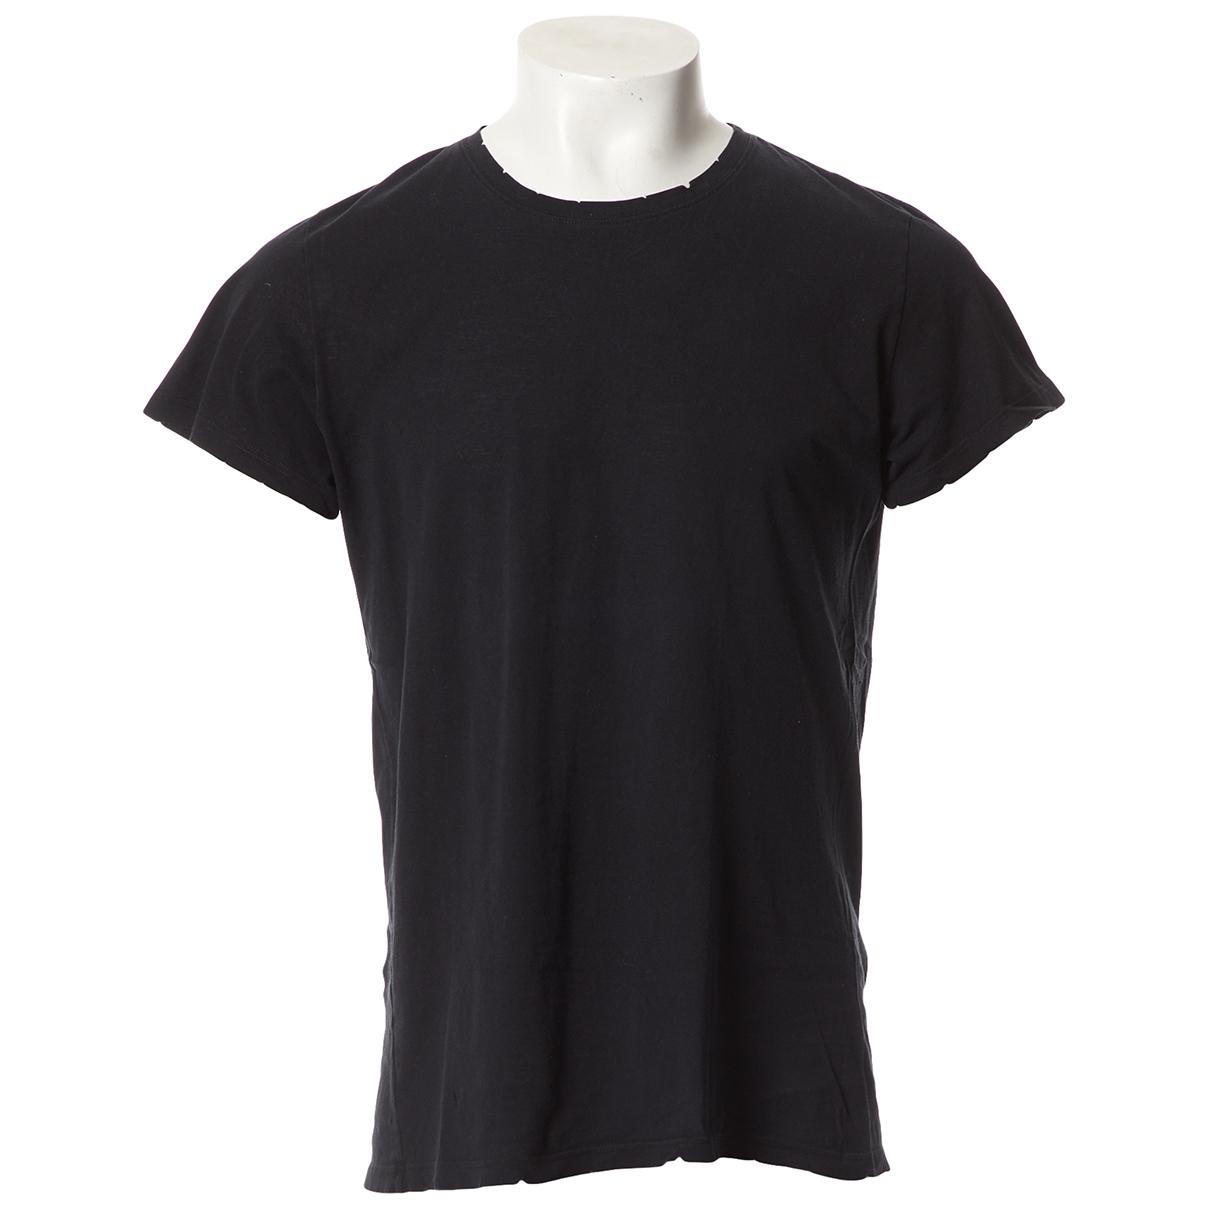 Balmain \N T-Shirts in  Schwarz Baumwolle